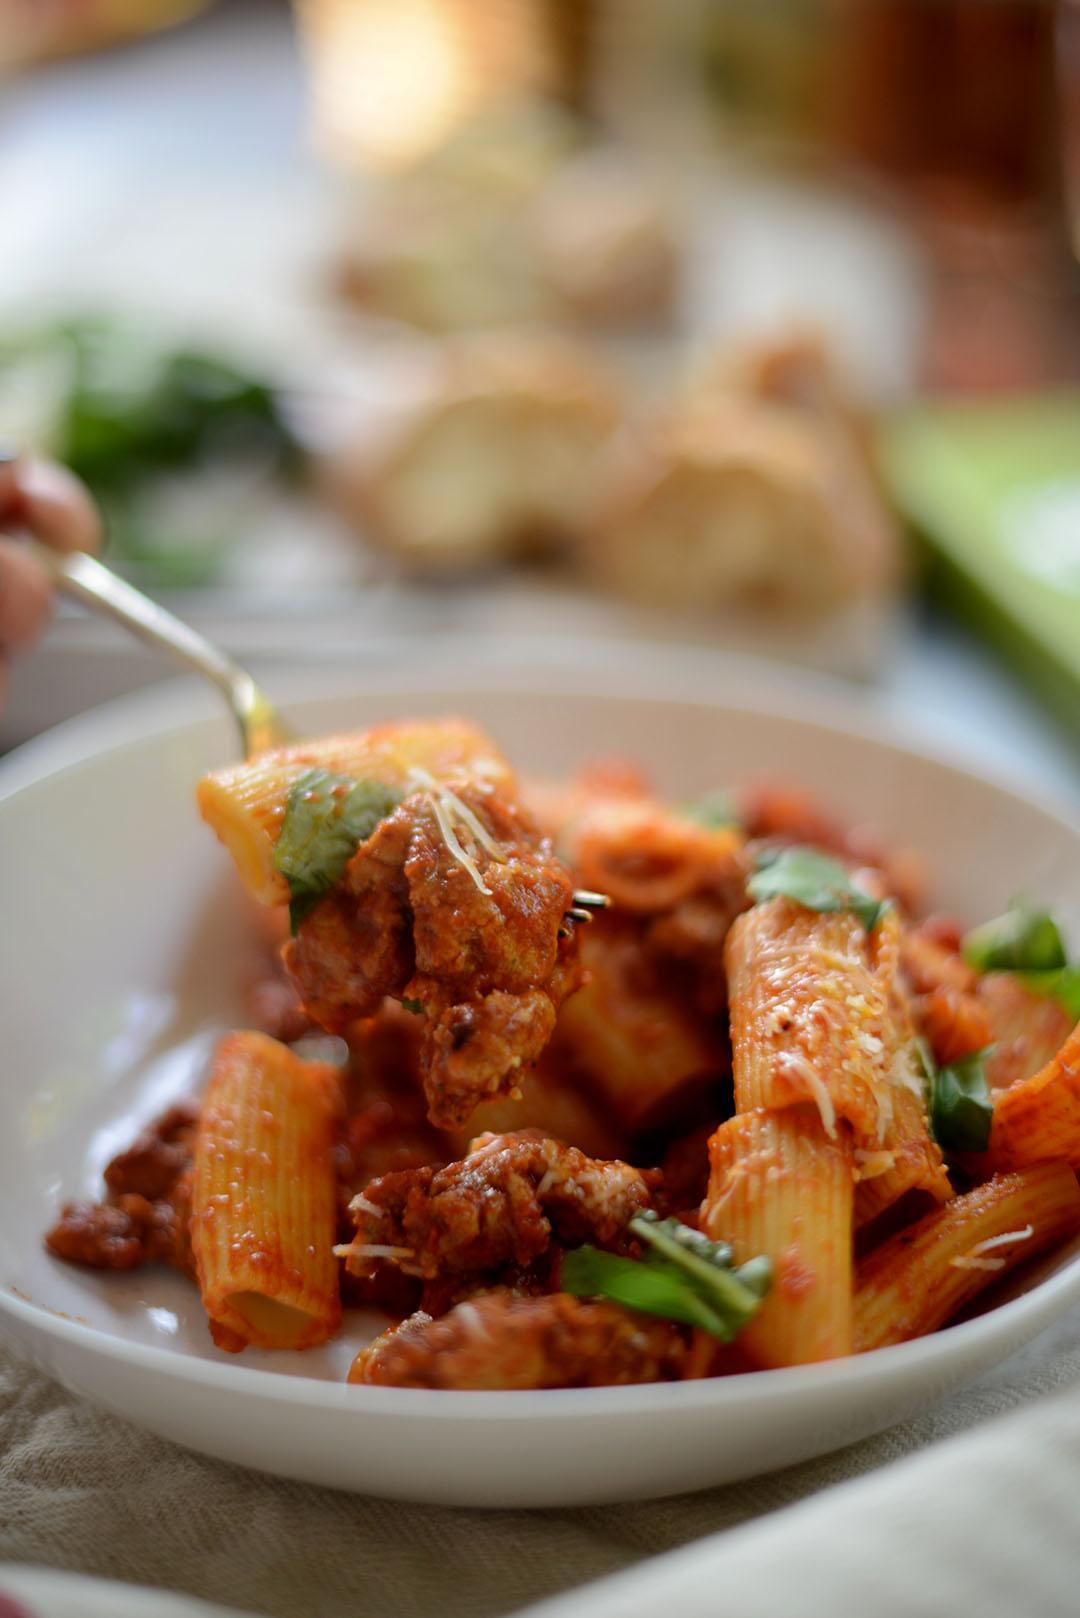 spicy sausage meat rigatoni supper recipe